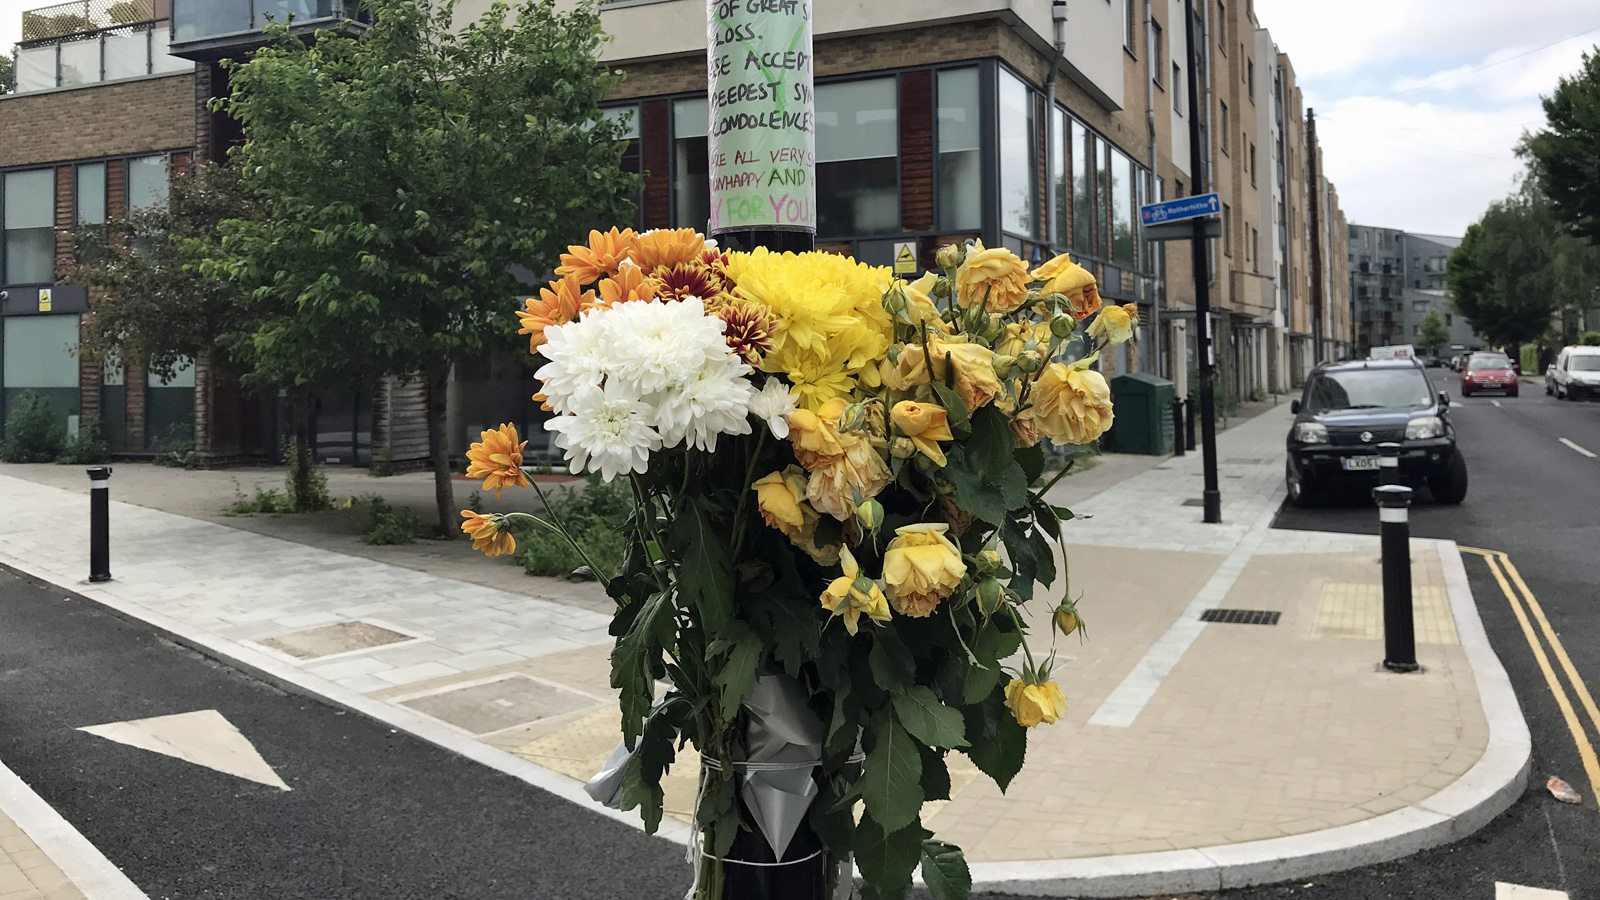 Ex-cycling czar criticises council 'cowardice' after Deptford bike death